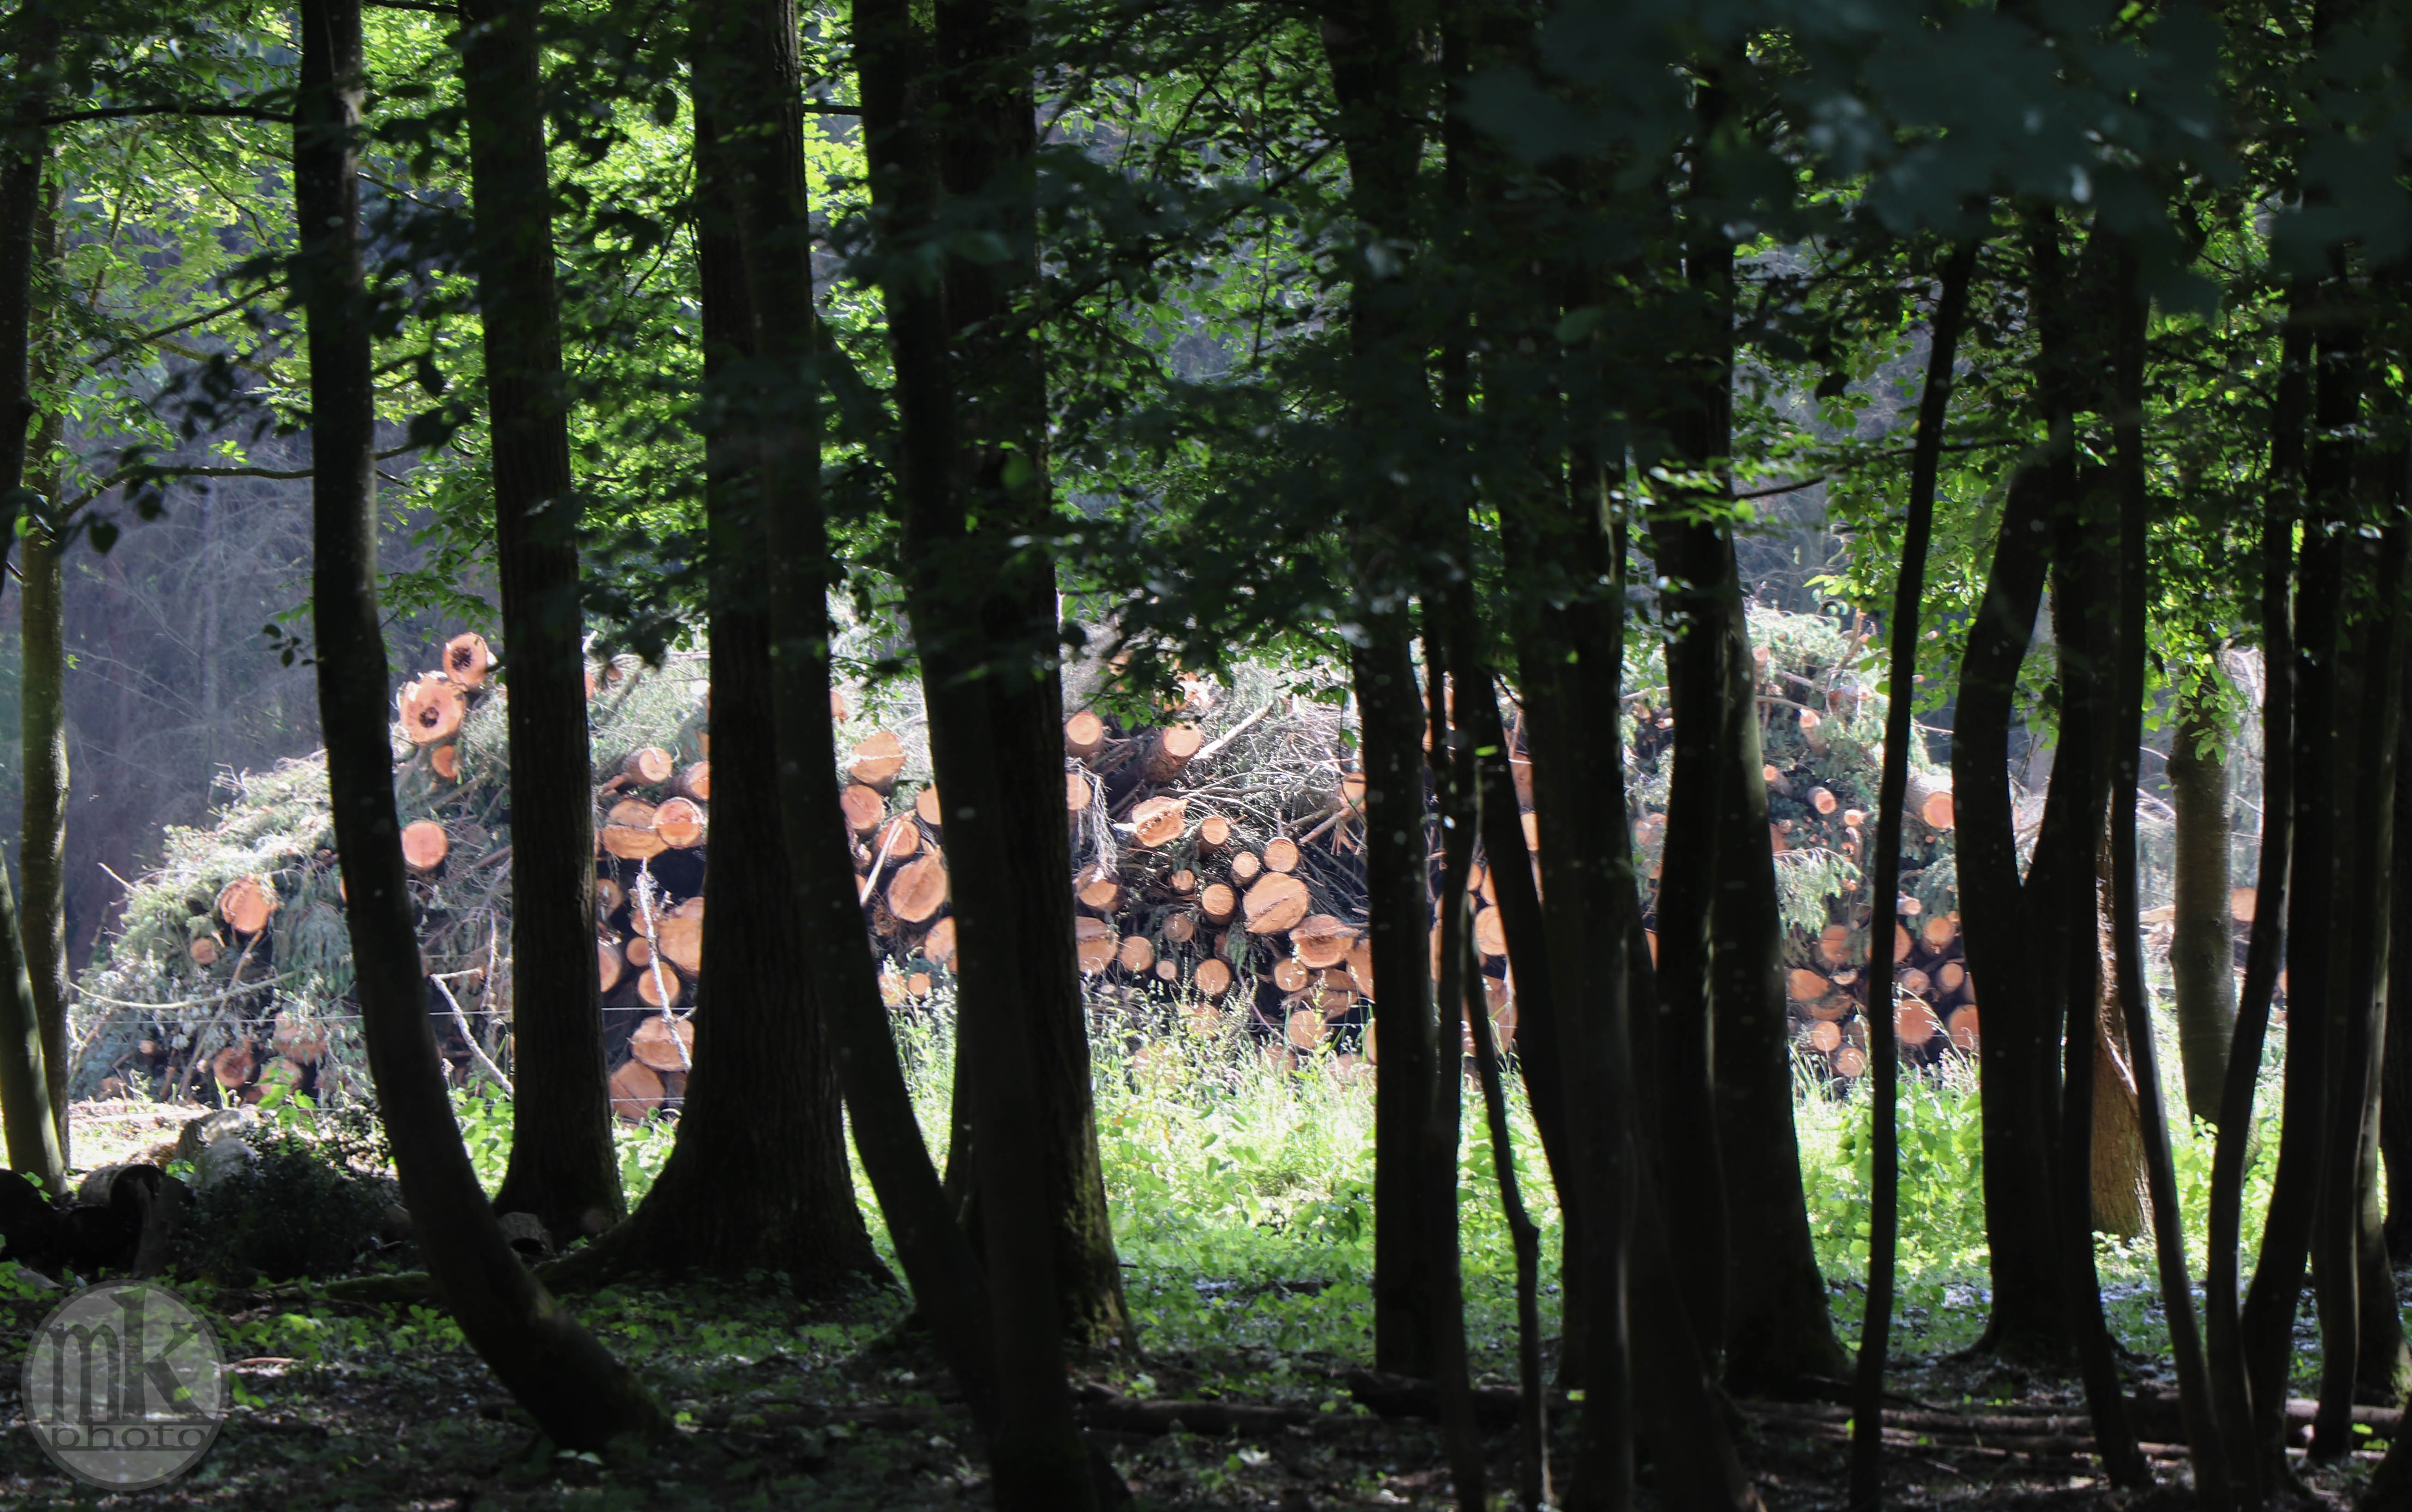 arbre, , Piré s-Seiche, 21 mai 2020, 16-10